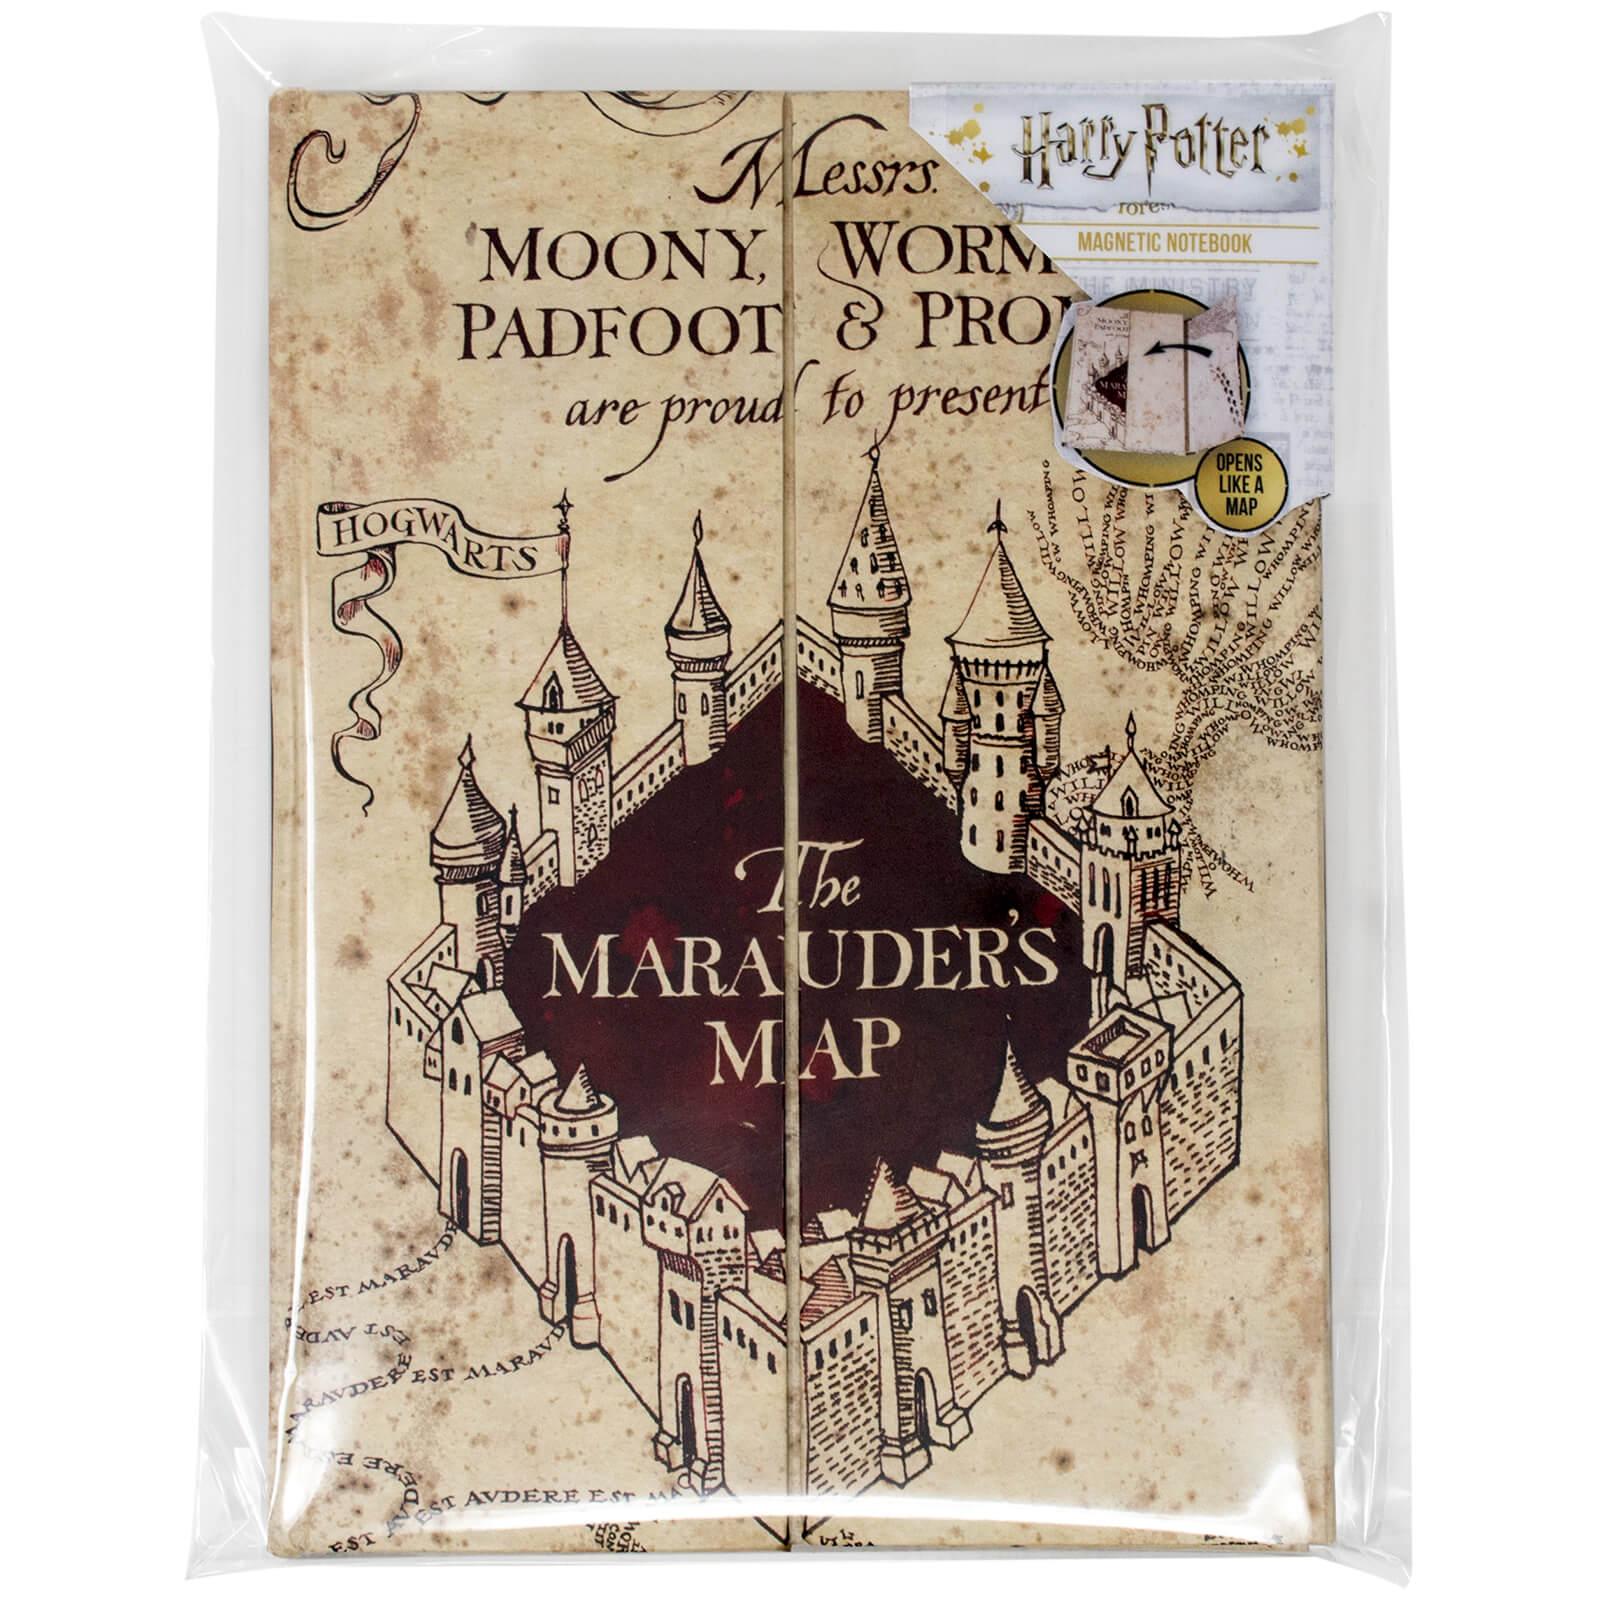 Karte Des Rumtreibers.Harry Potter Karte Des Rumtreibers A5 Notizbuch